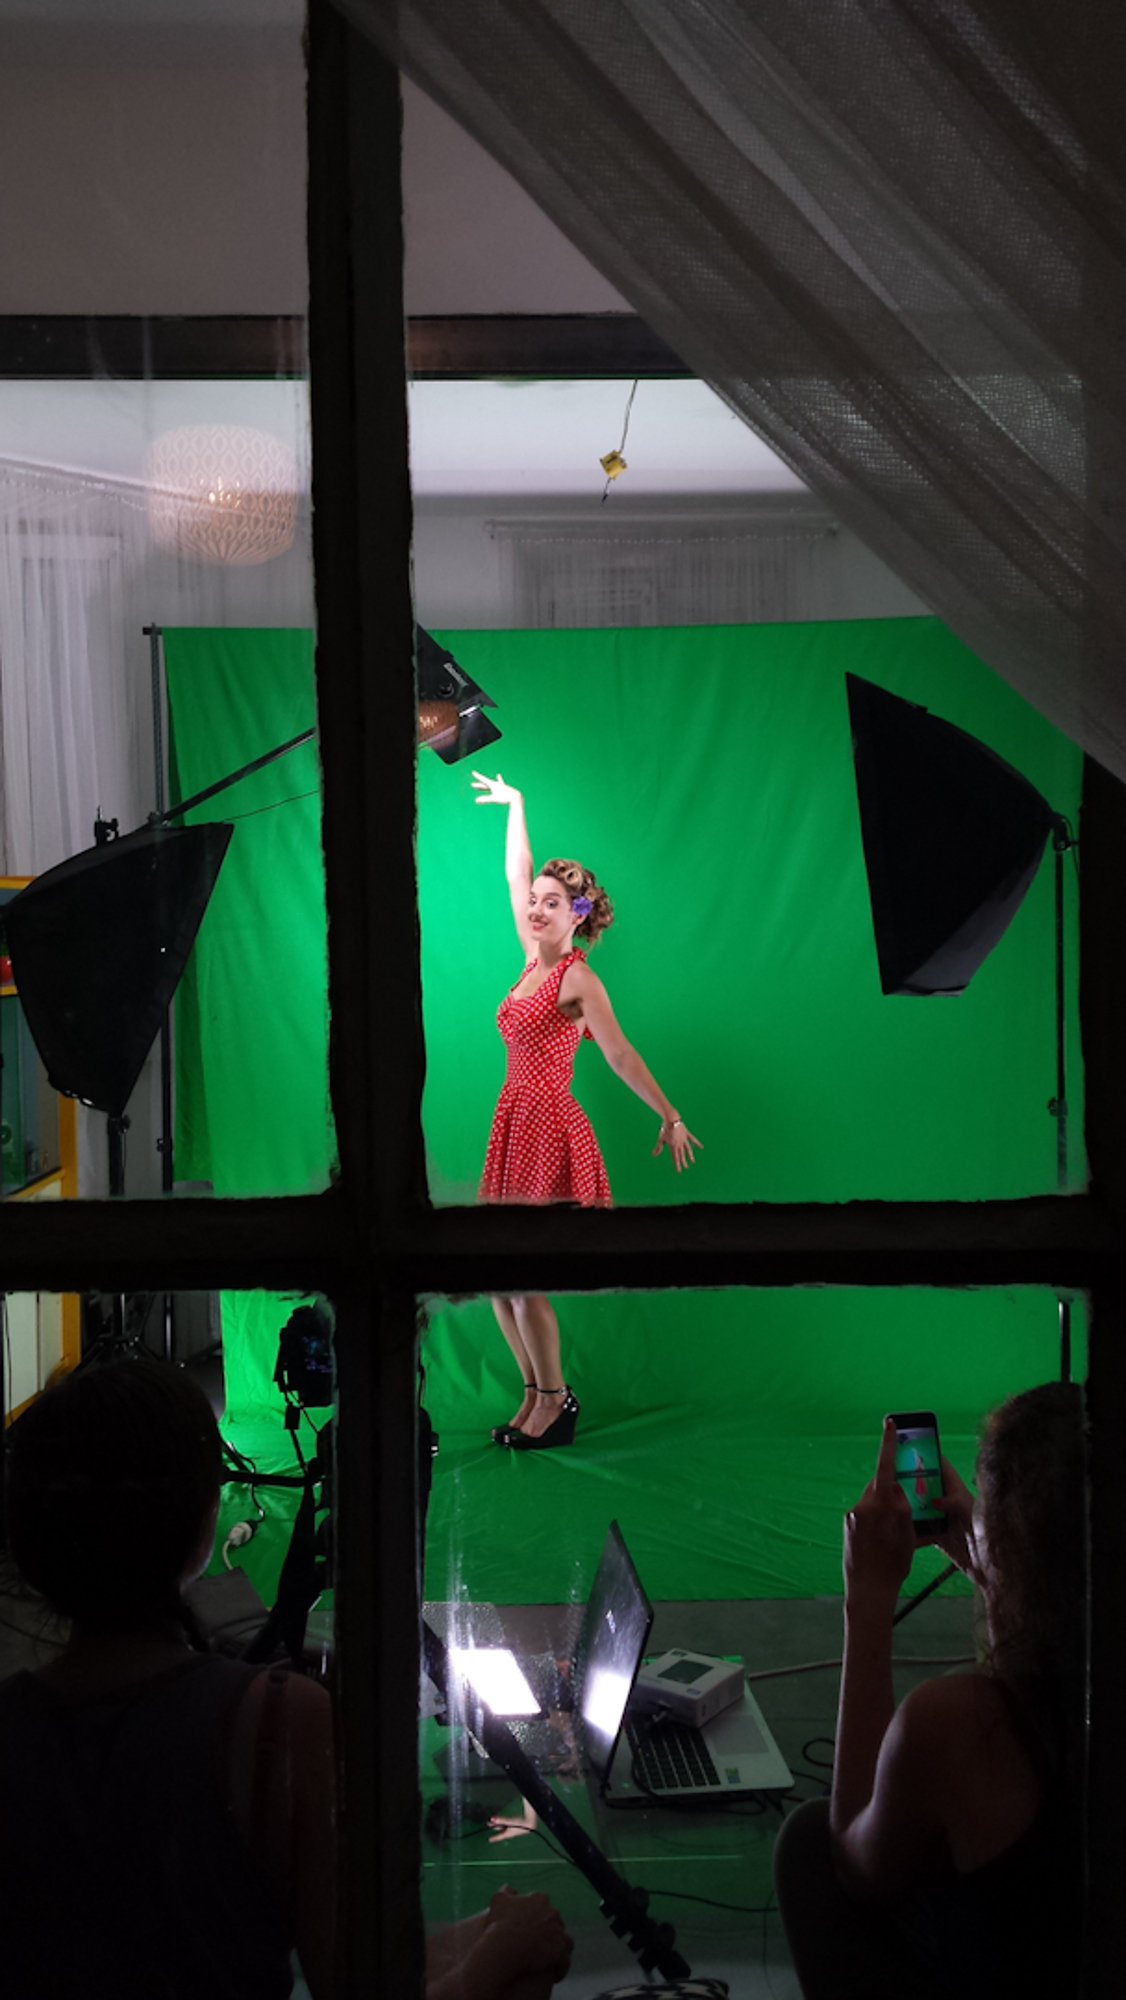 making-of-tournage-fond-vert-clip-musique